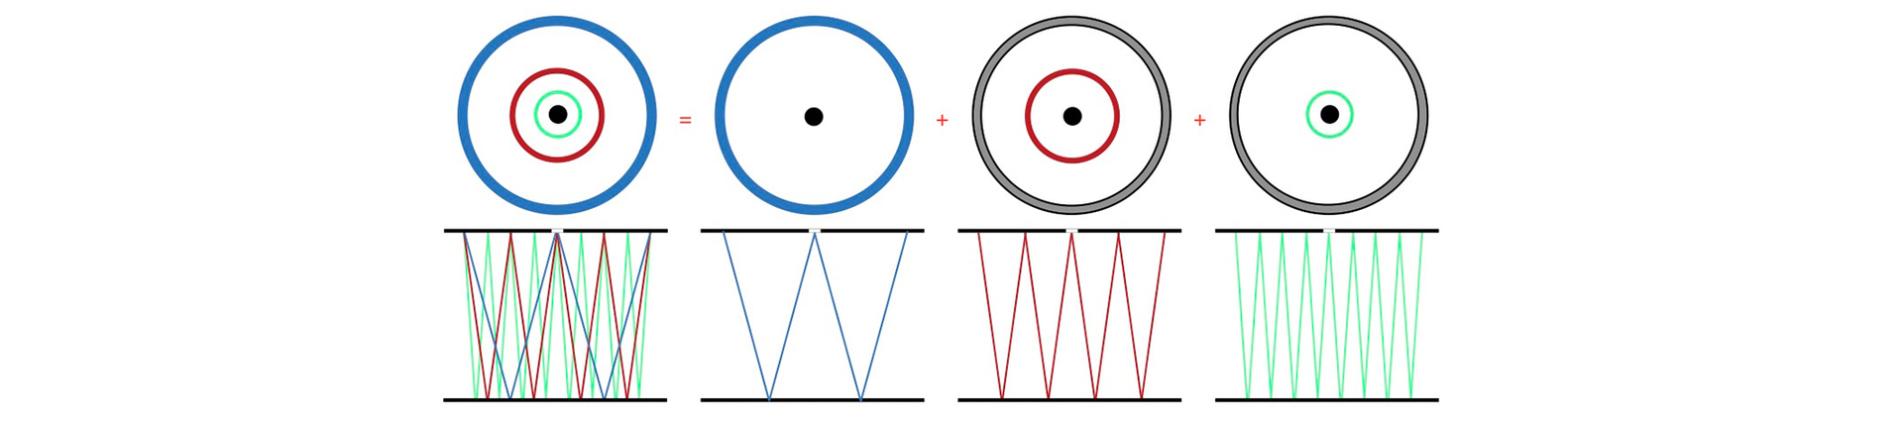 Camera alignment pattern